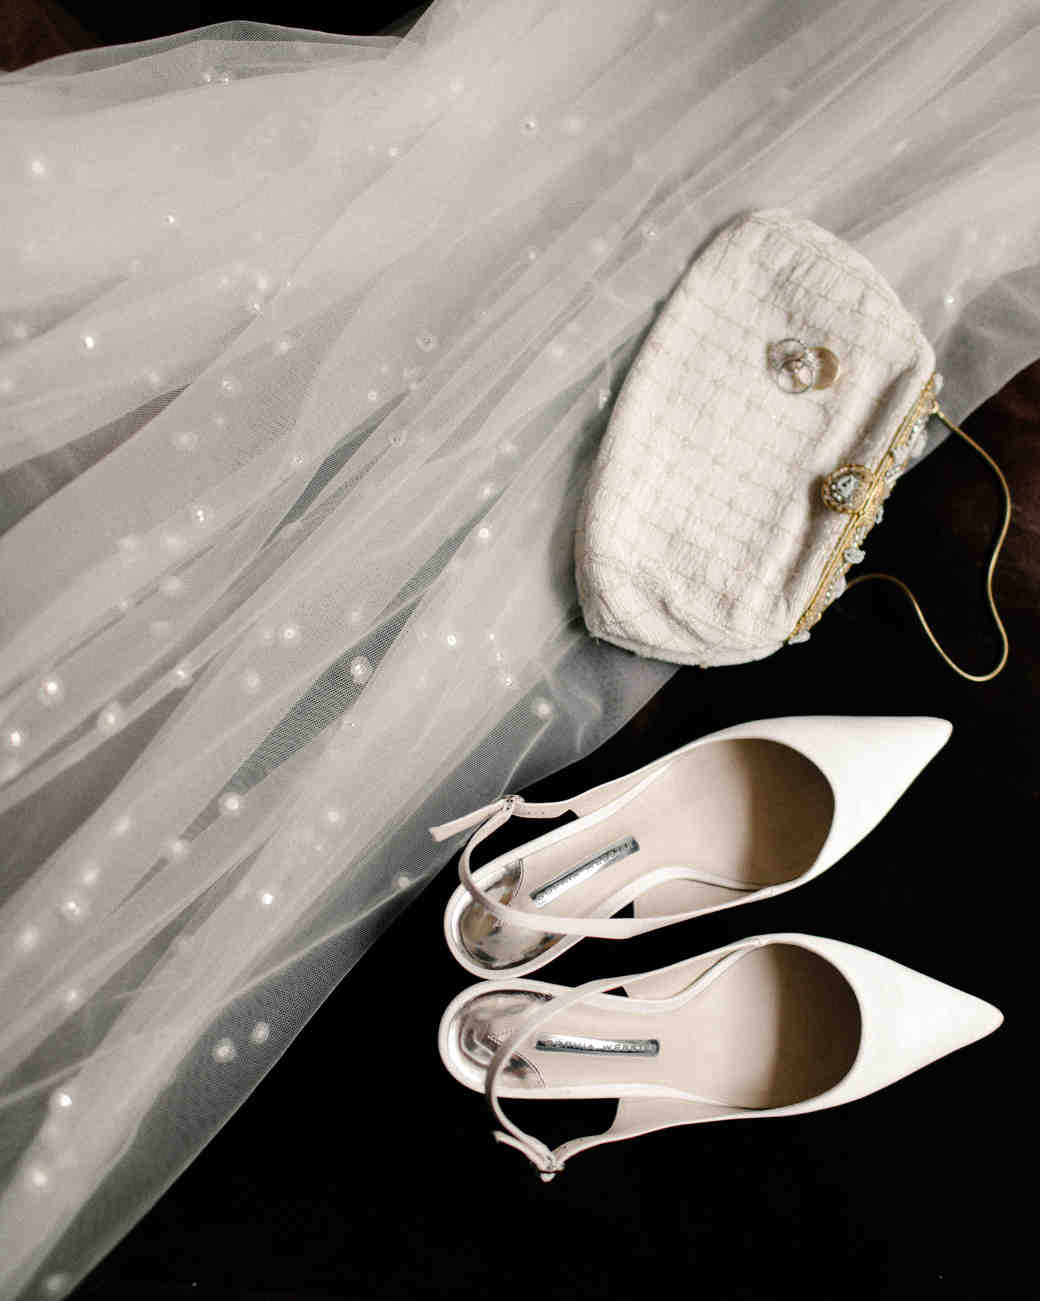 mia patrick wedding bride accessories shoes veil purse